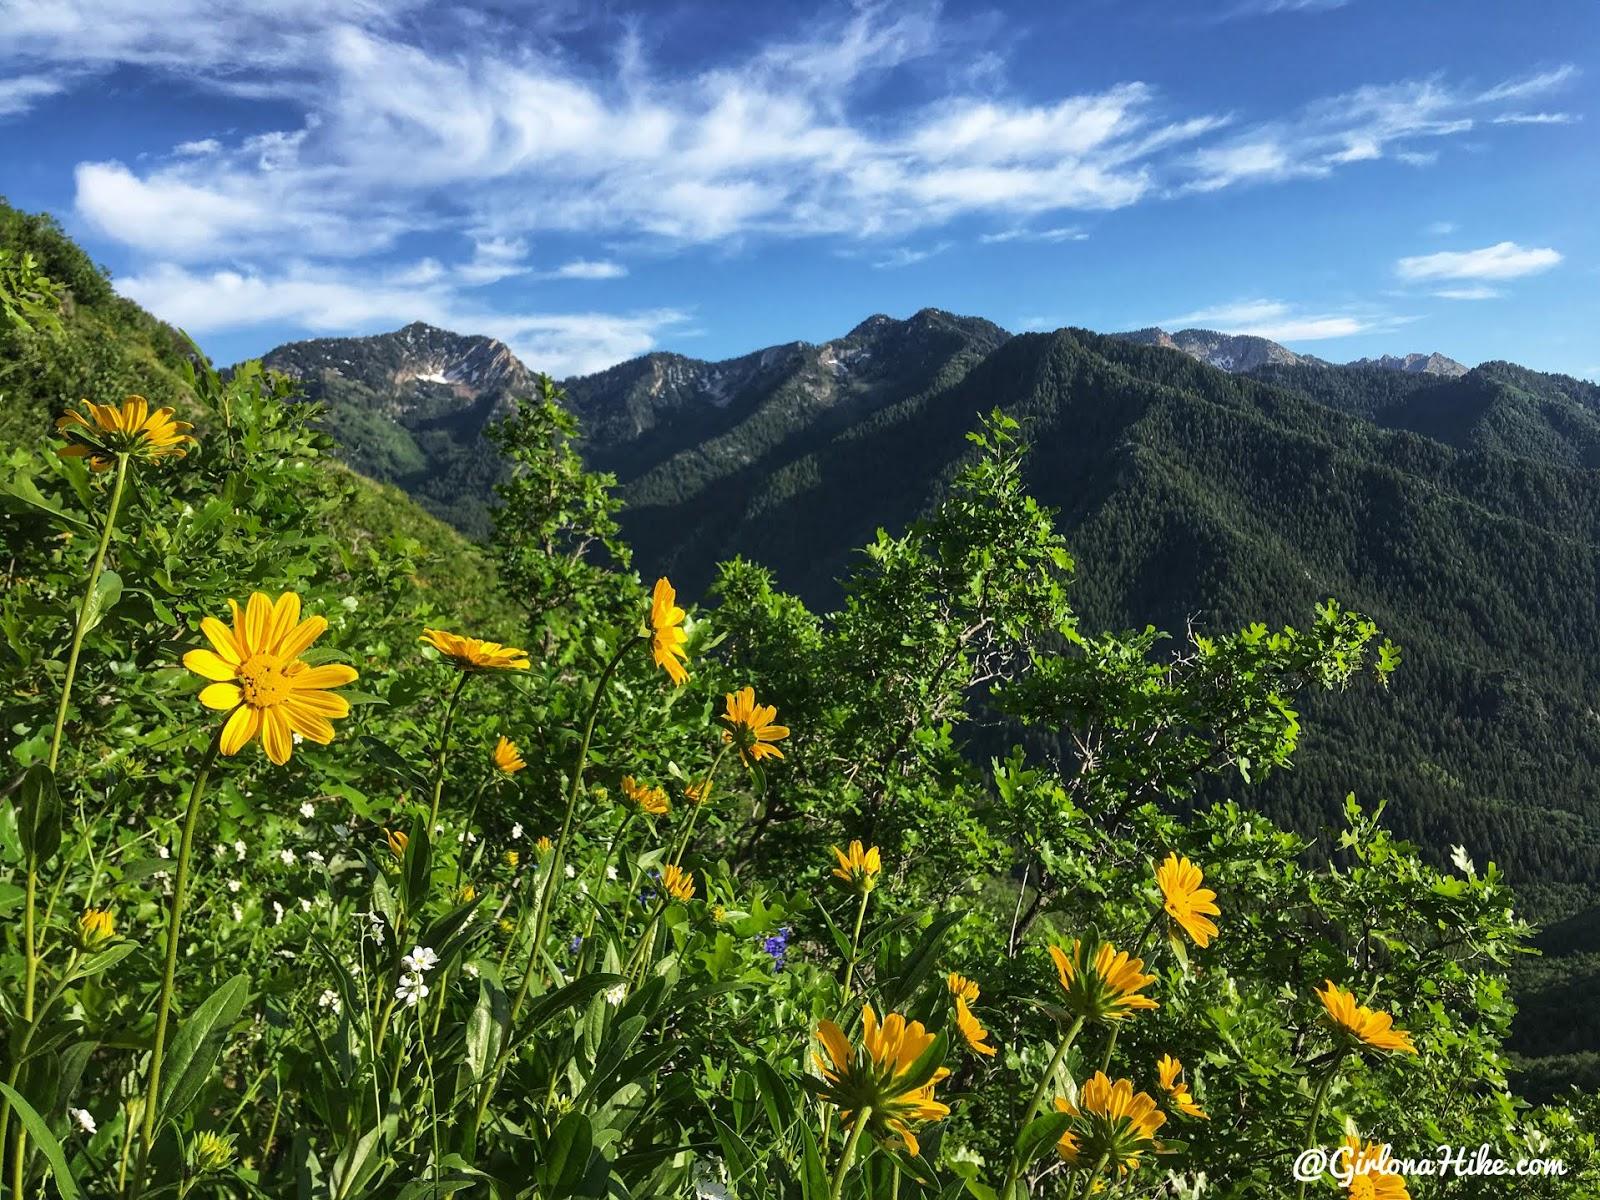 Hiking to Church Fork Peak, Milcreek Canyon